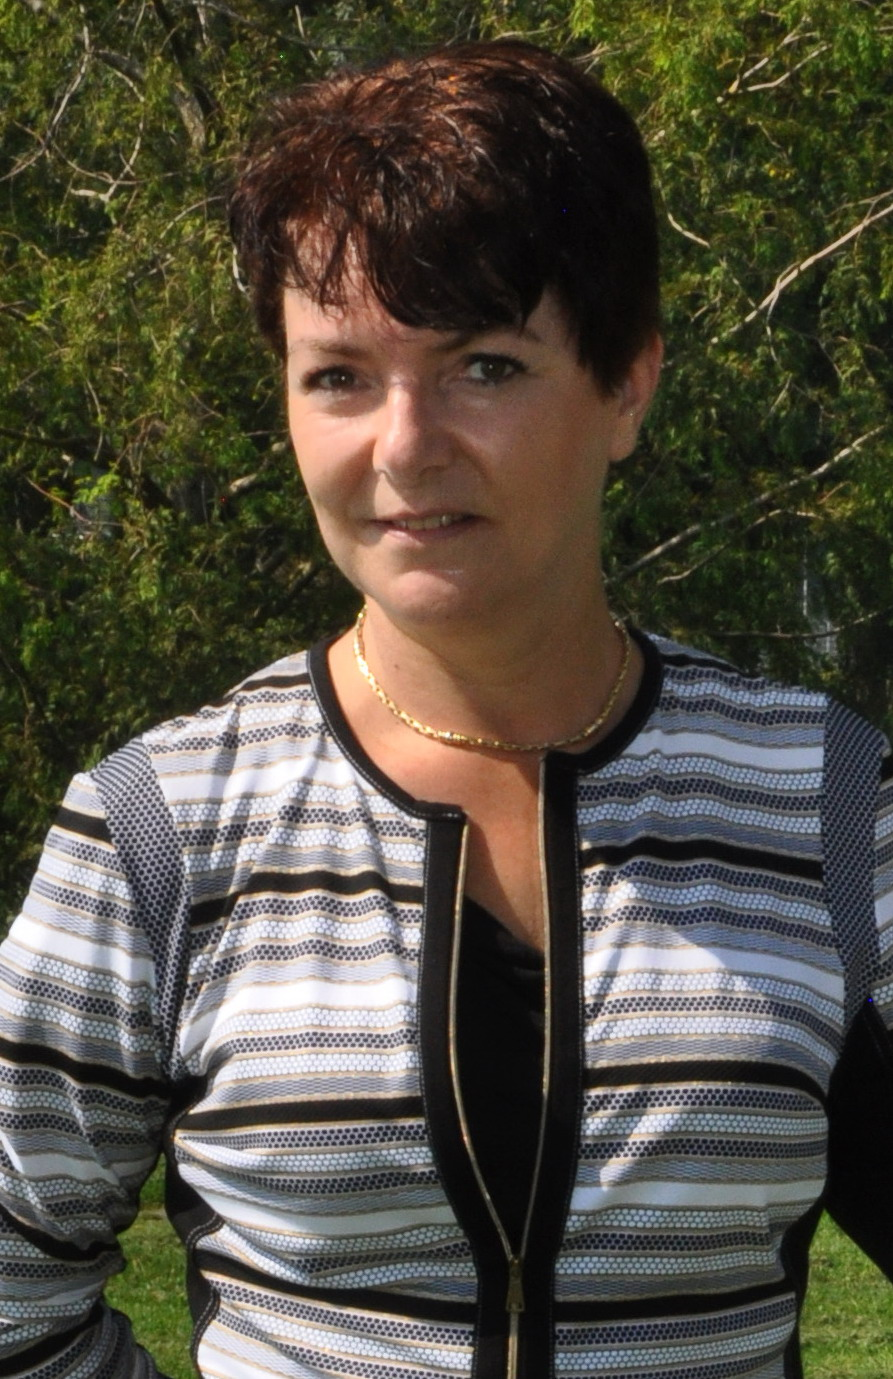 Anja Morit